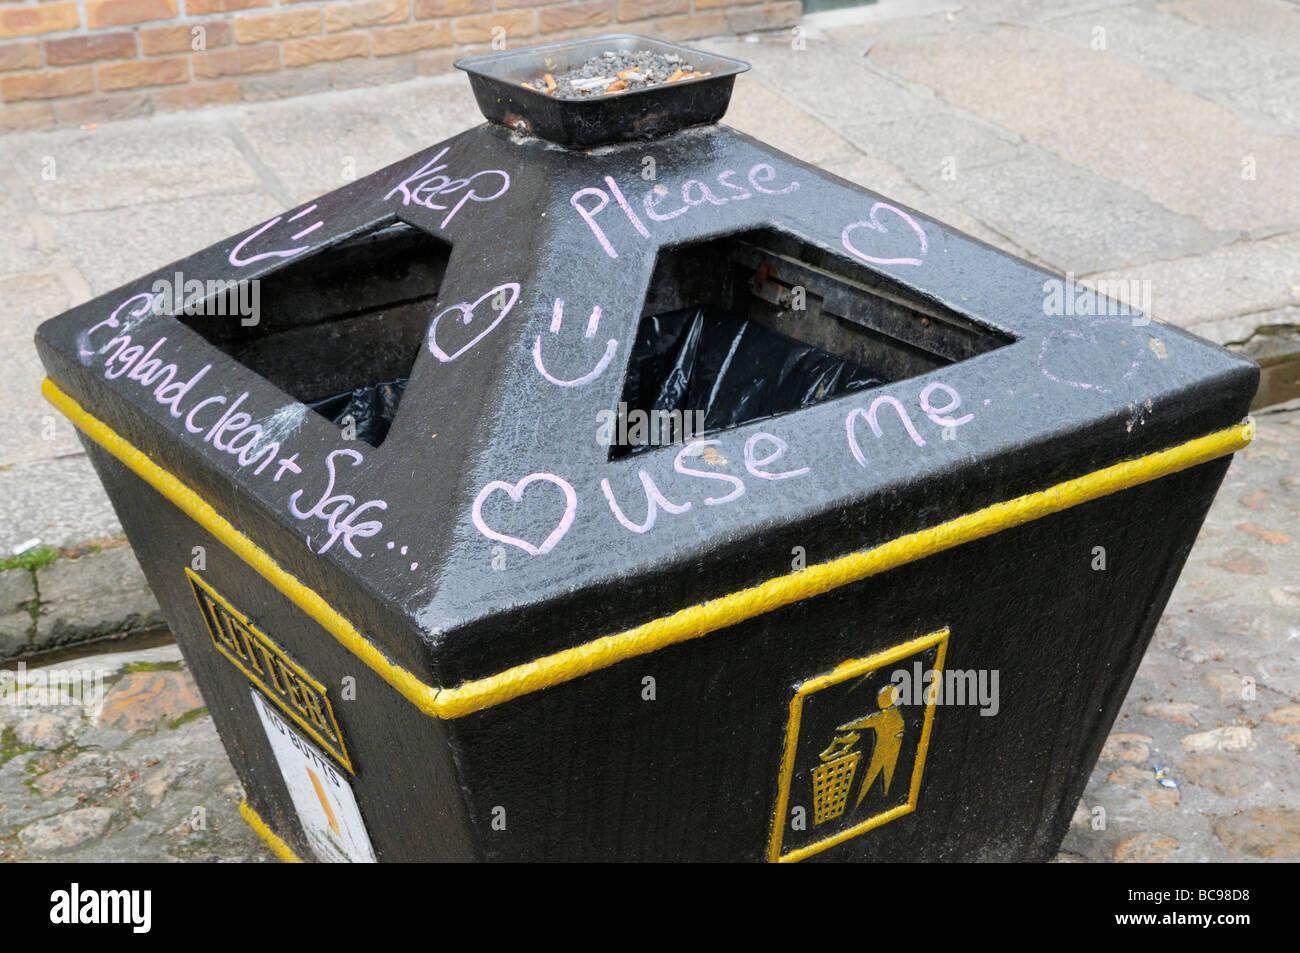 Public litter bin covered in graffiti message - Stock Image